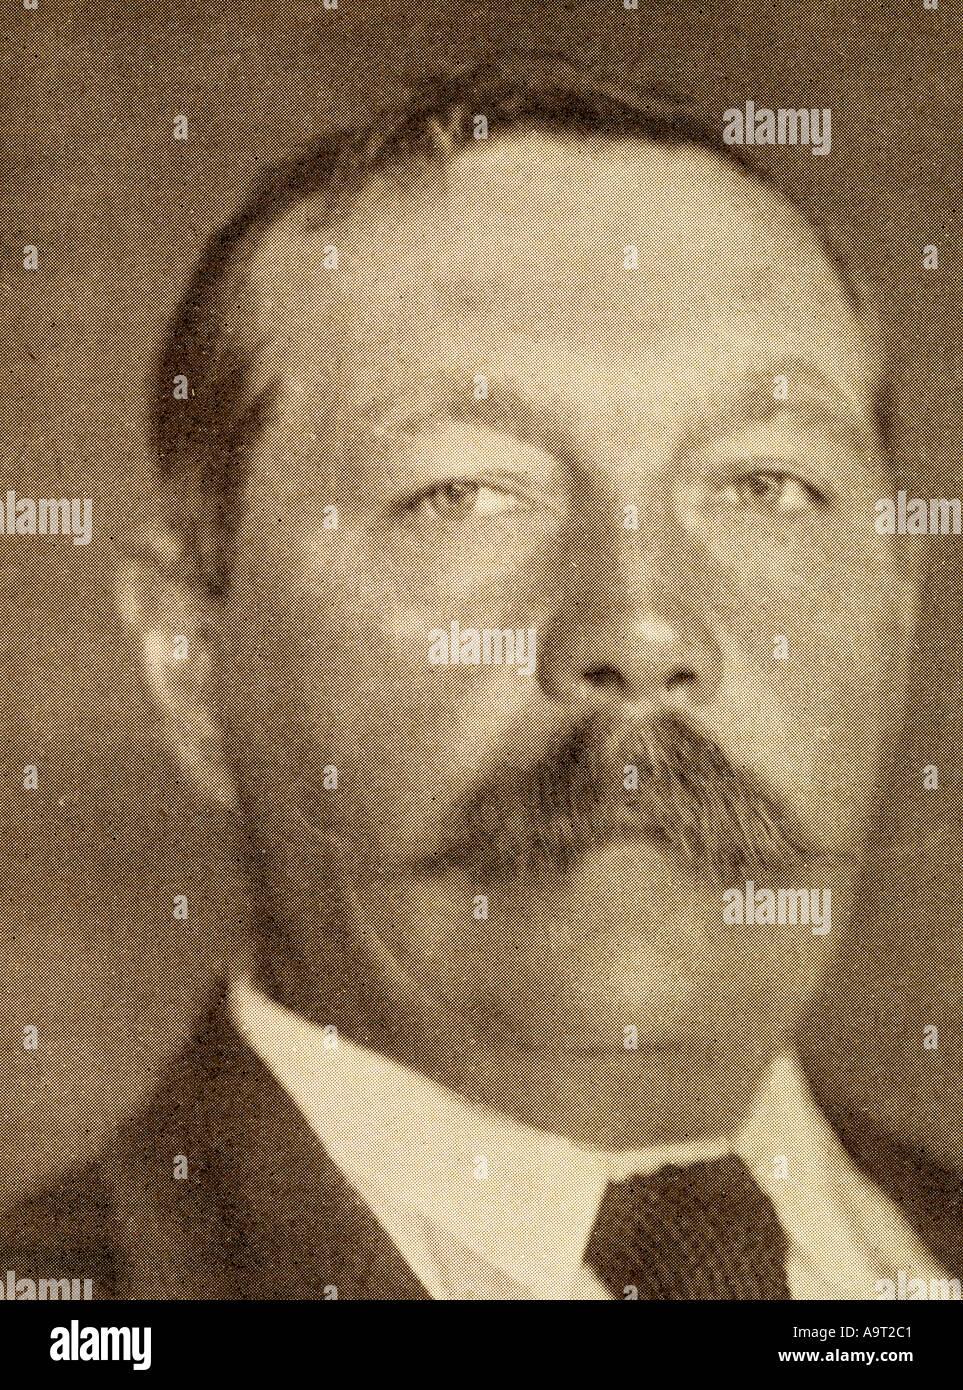 Sir Arthur Conan Doyle, 1859 - 1930.  British writer and doctor. - Stock Image